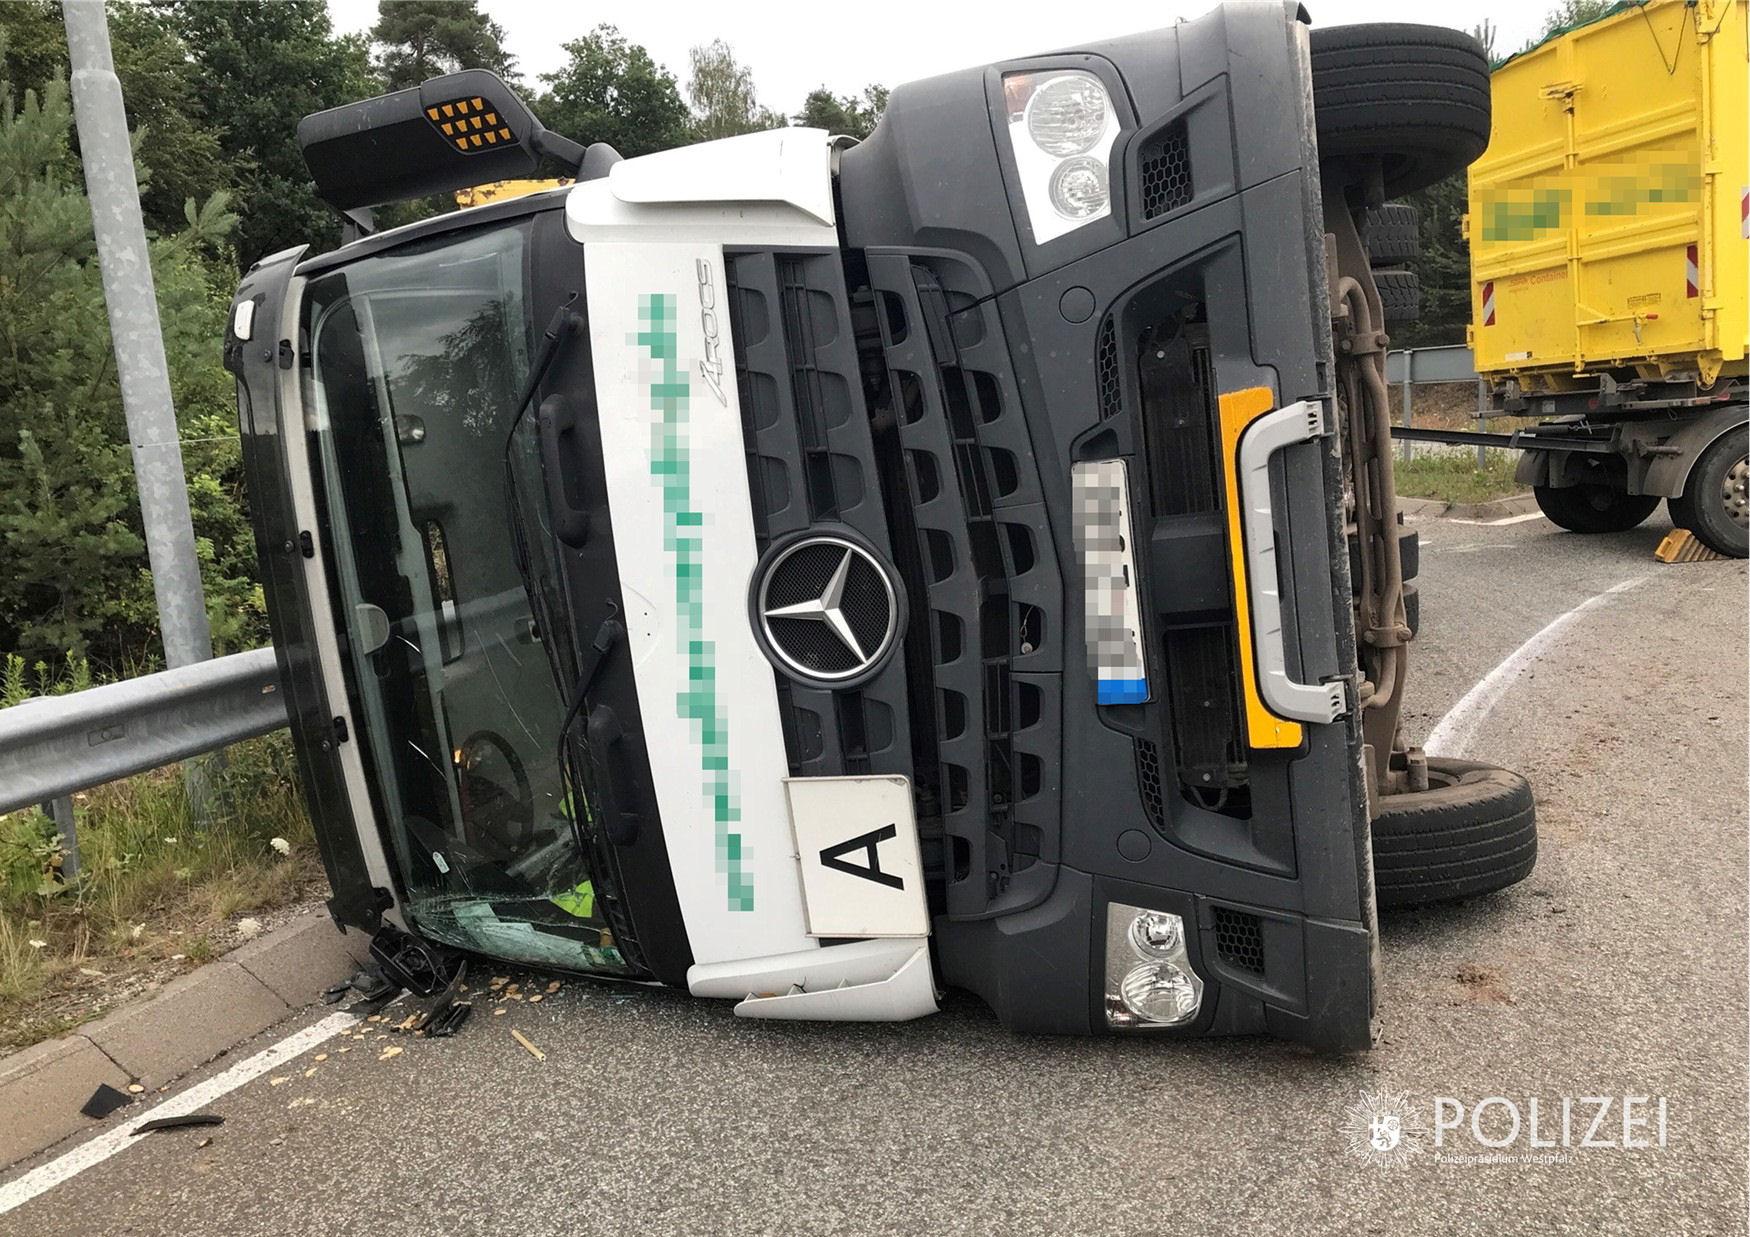 Lkw kippt im Kreisel um – Autobahnanbindung blockiert